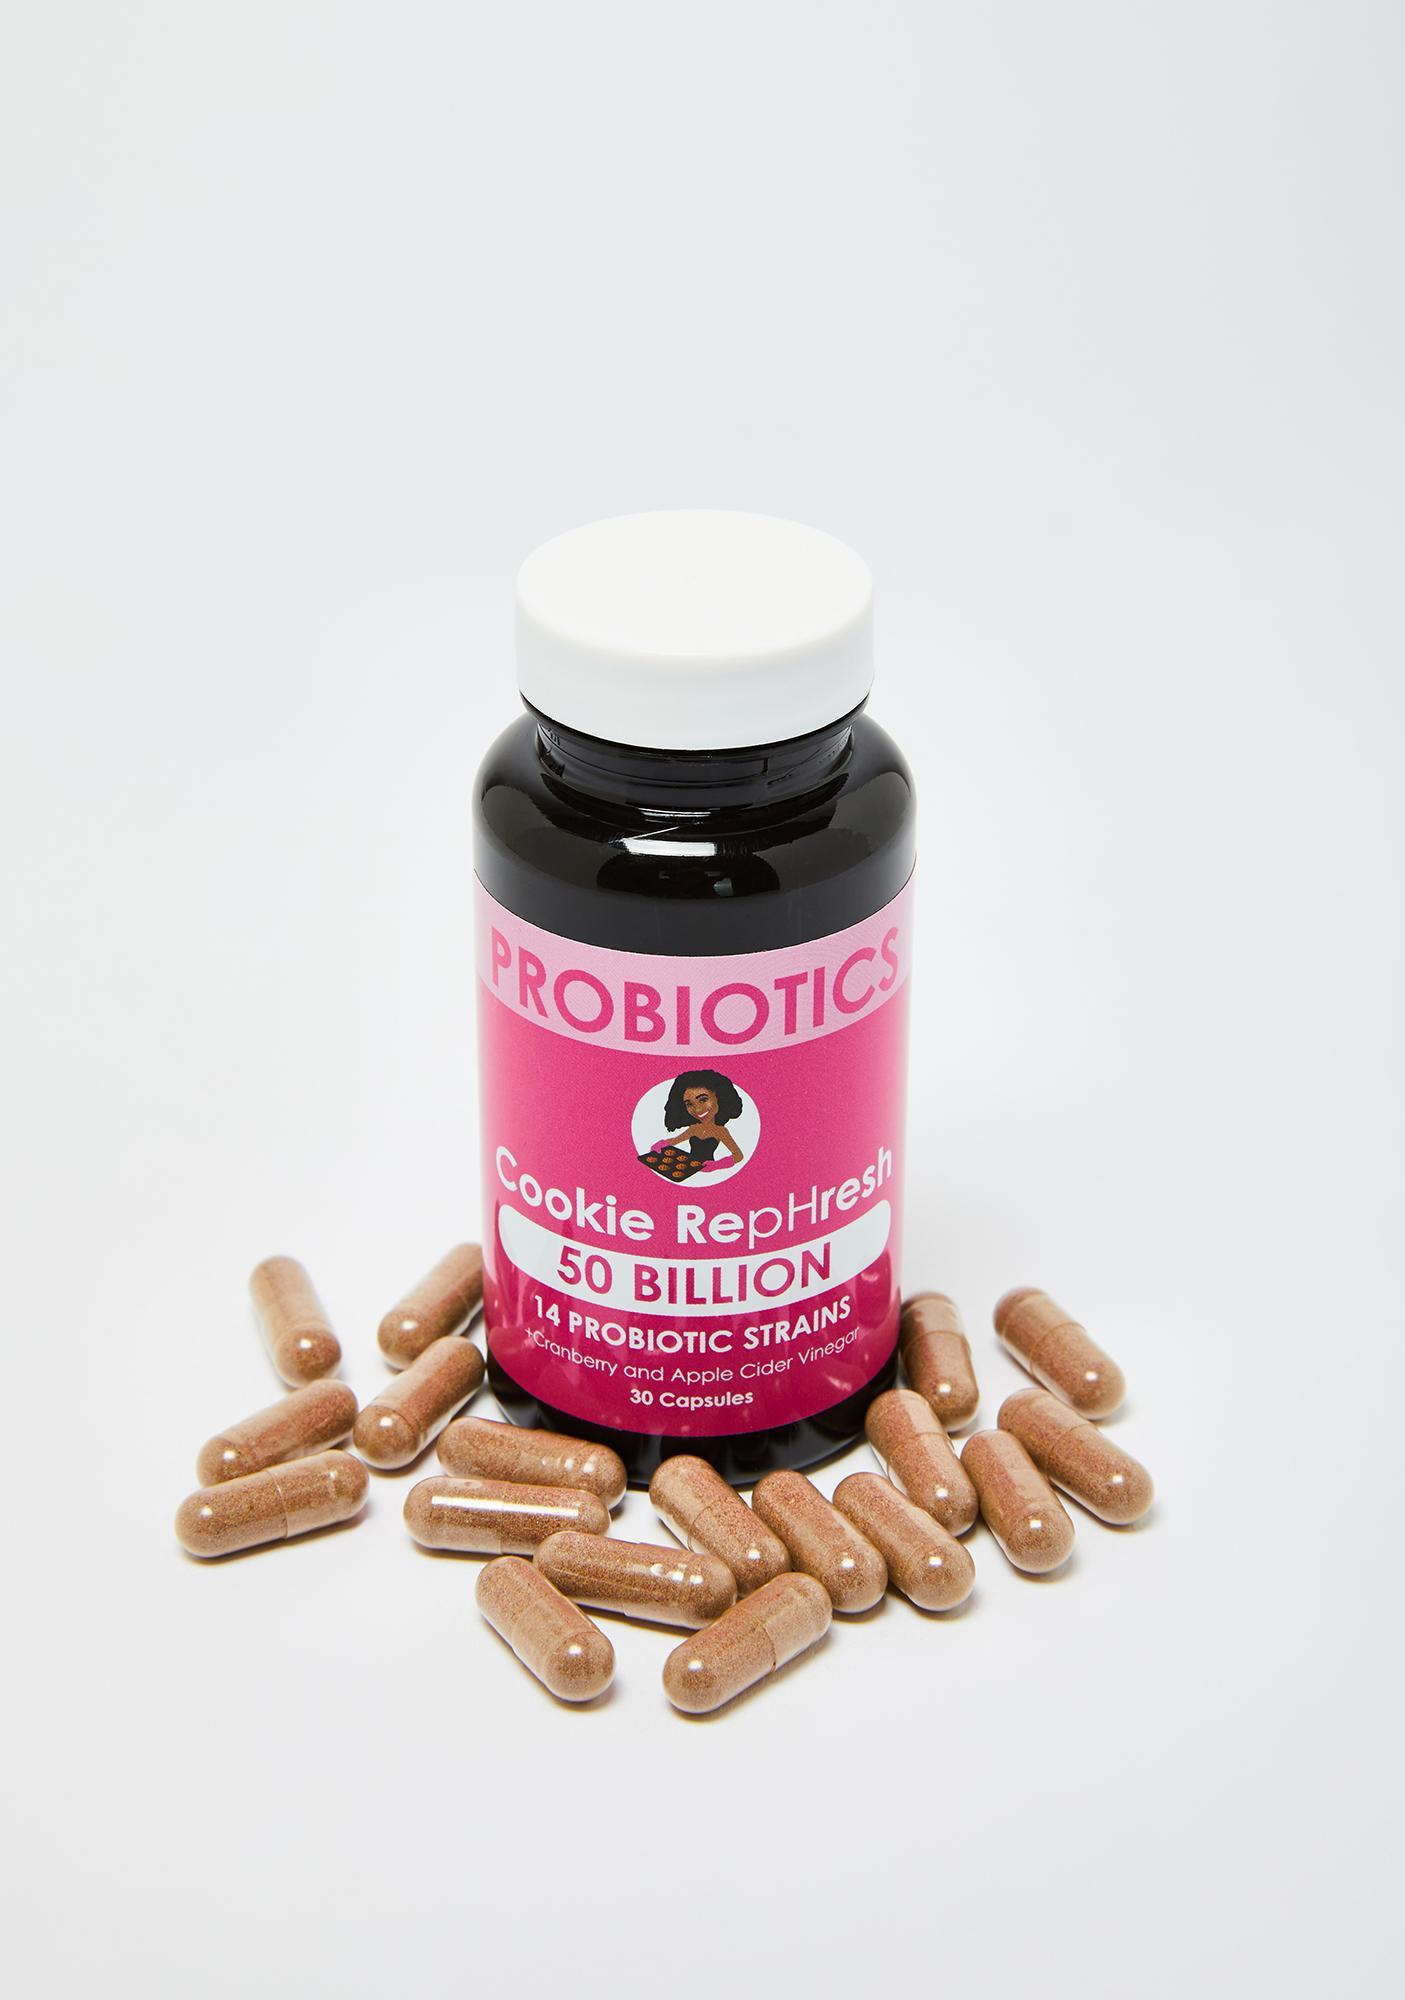 Sweet Cookies Cookie rePHresh Probiotics